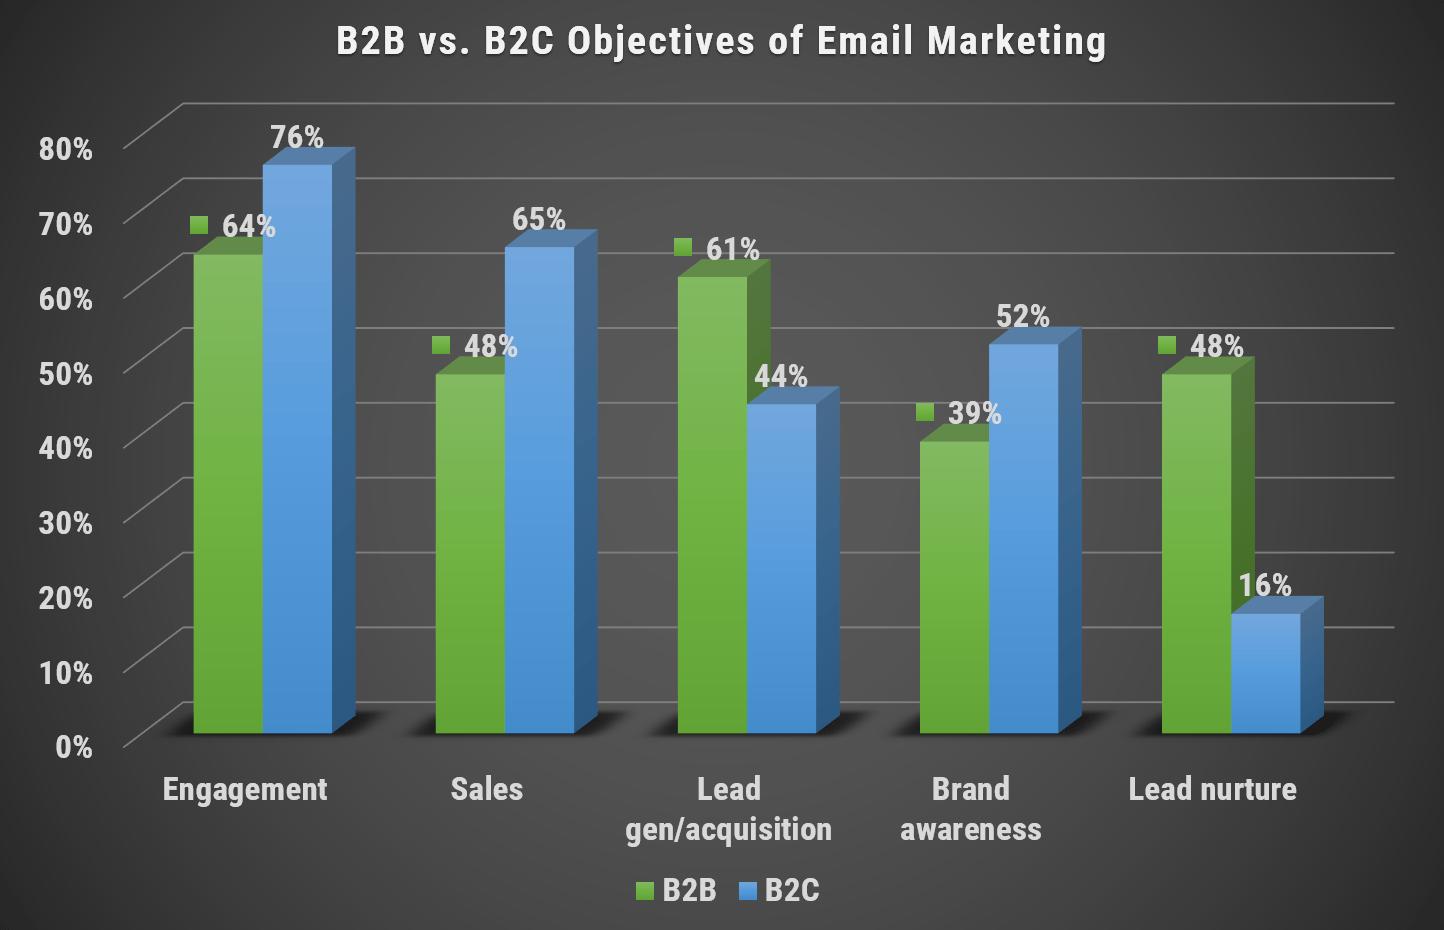 Image 1e.3. B2B vs. B2C Objectives of Email Marketing